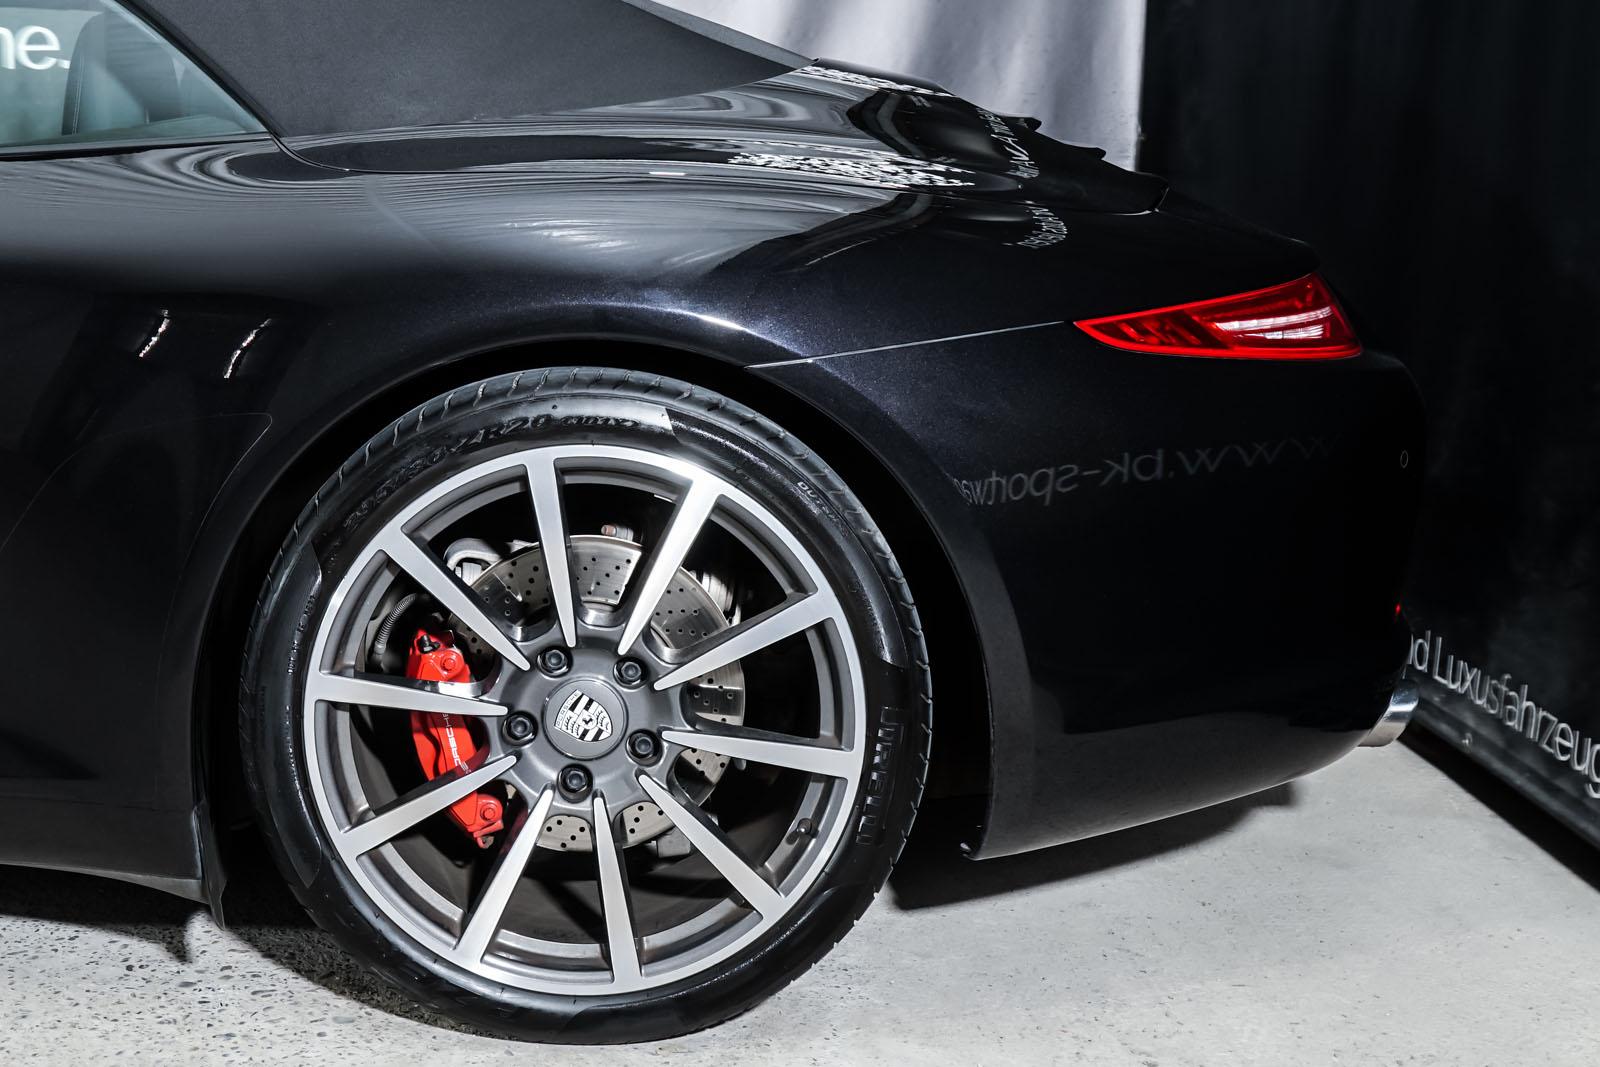 Porsche_991_CarreraS_Cabrio_Schwarz_Schwarz_POR-7555_4_w